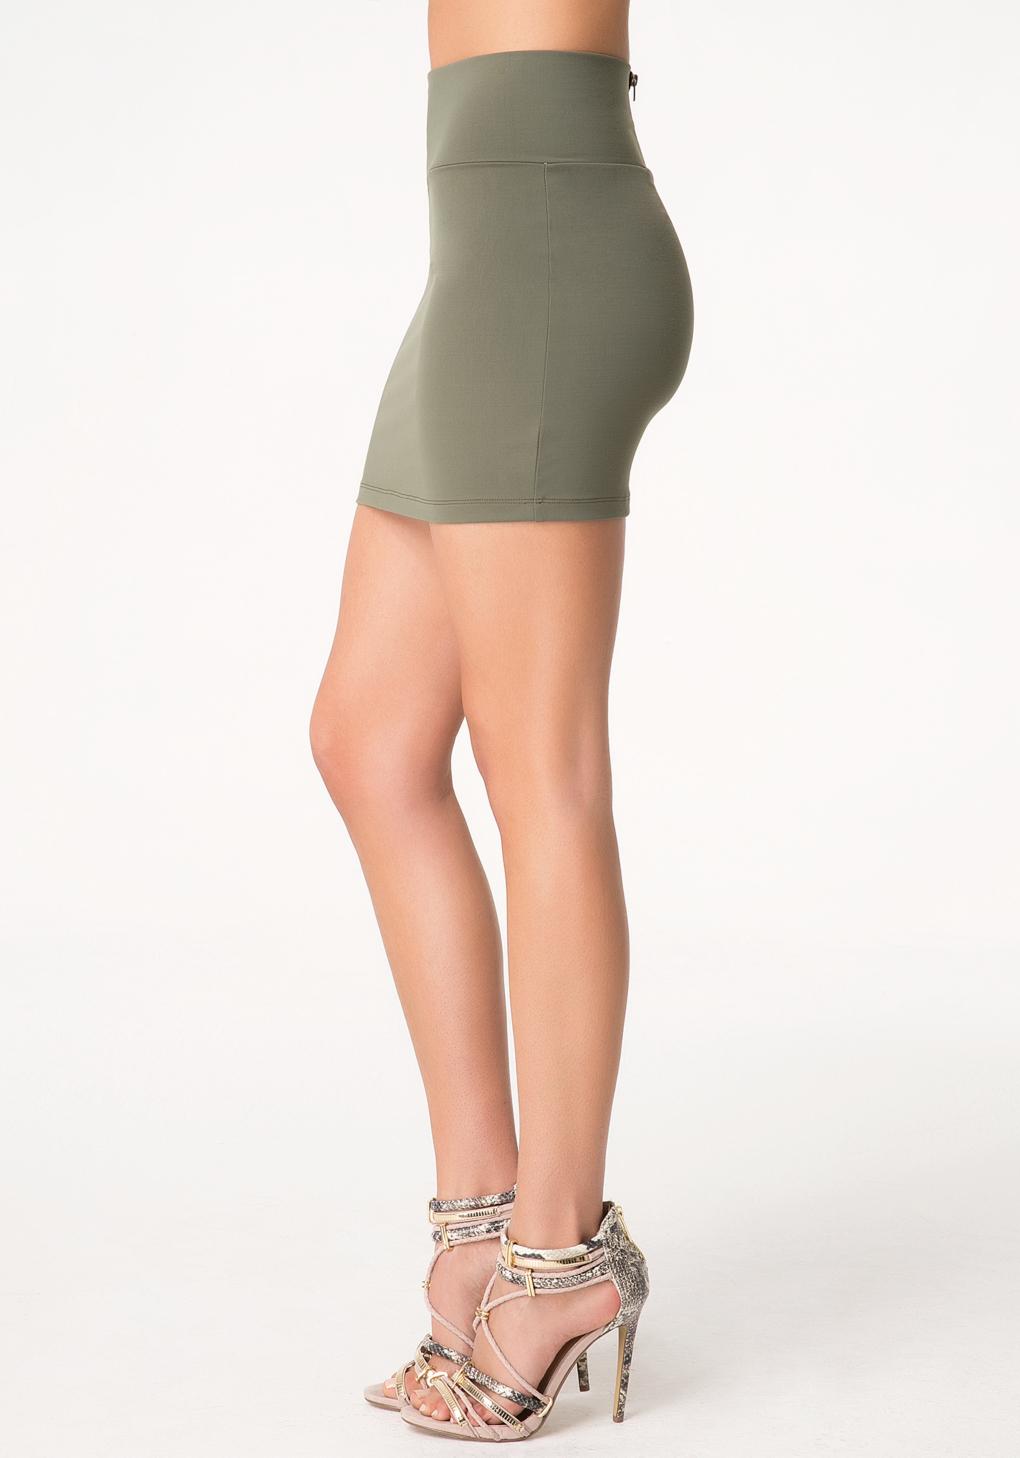 Bebe High Waist Mini Skirt in Green | Lyst